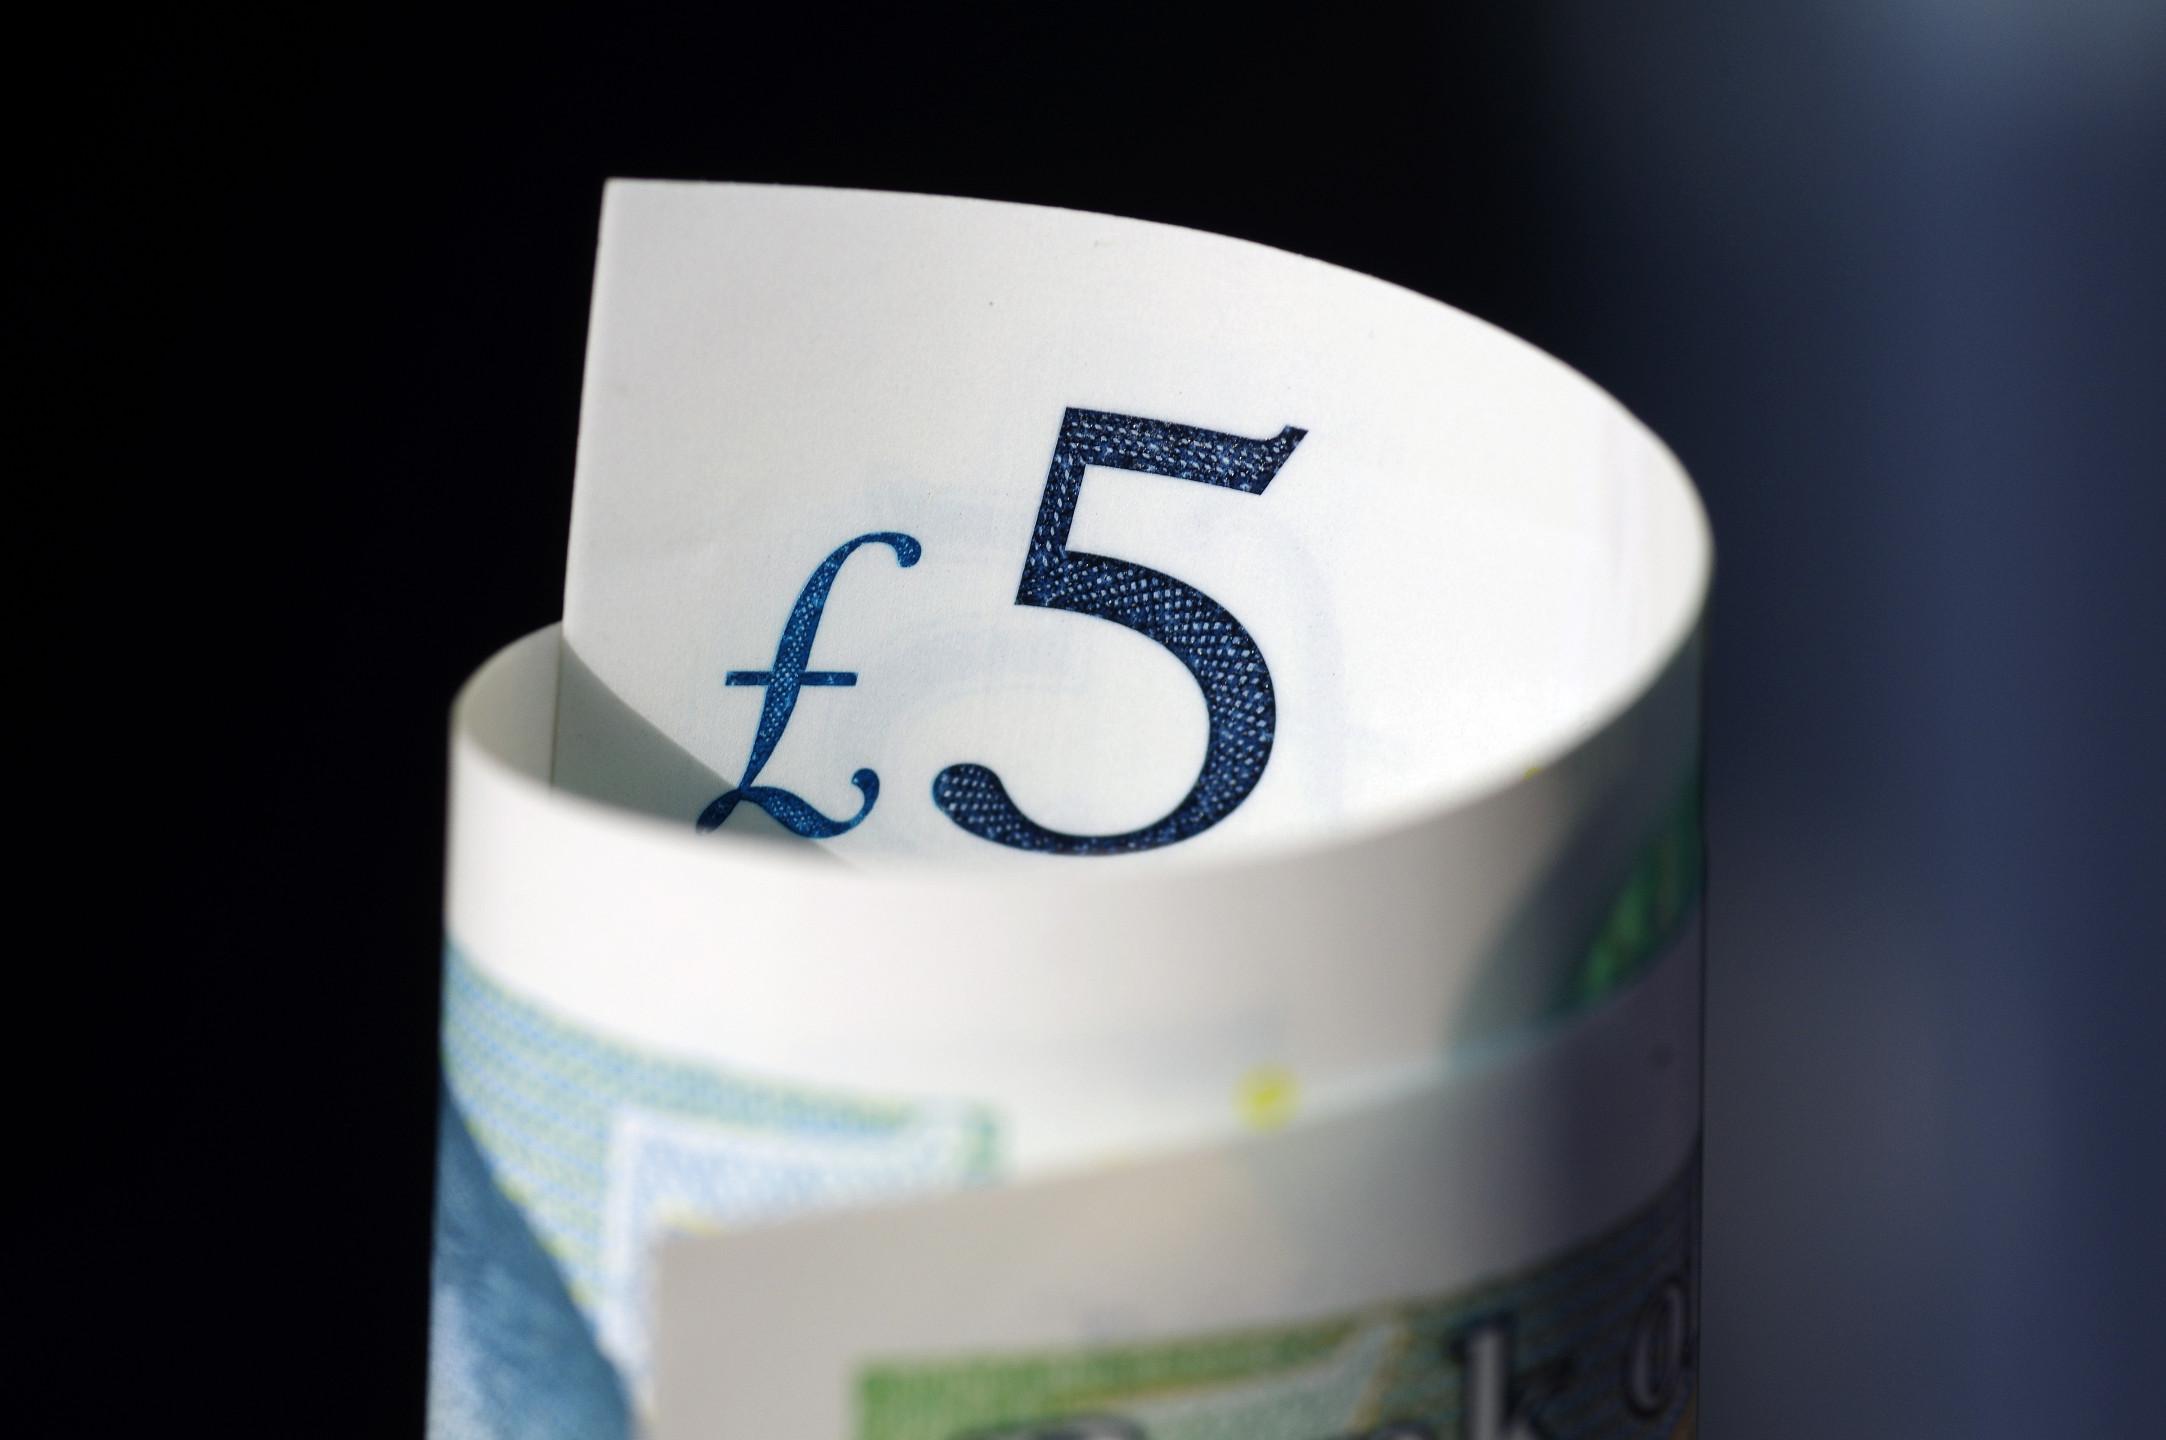 GBPUSD price climbs steadily beyond 1.30